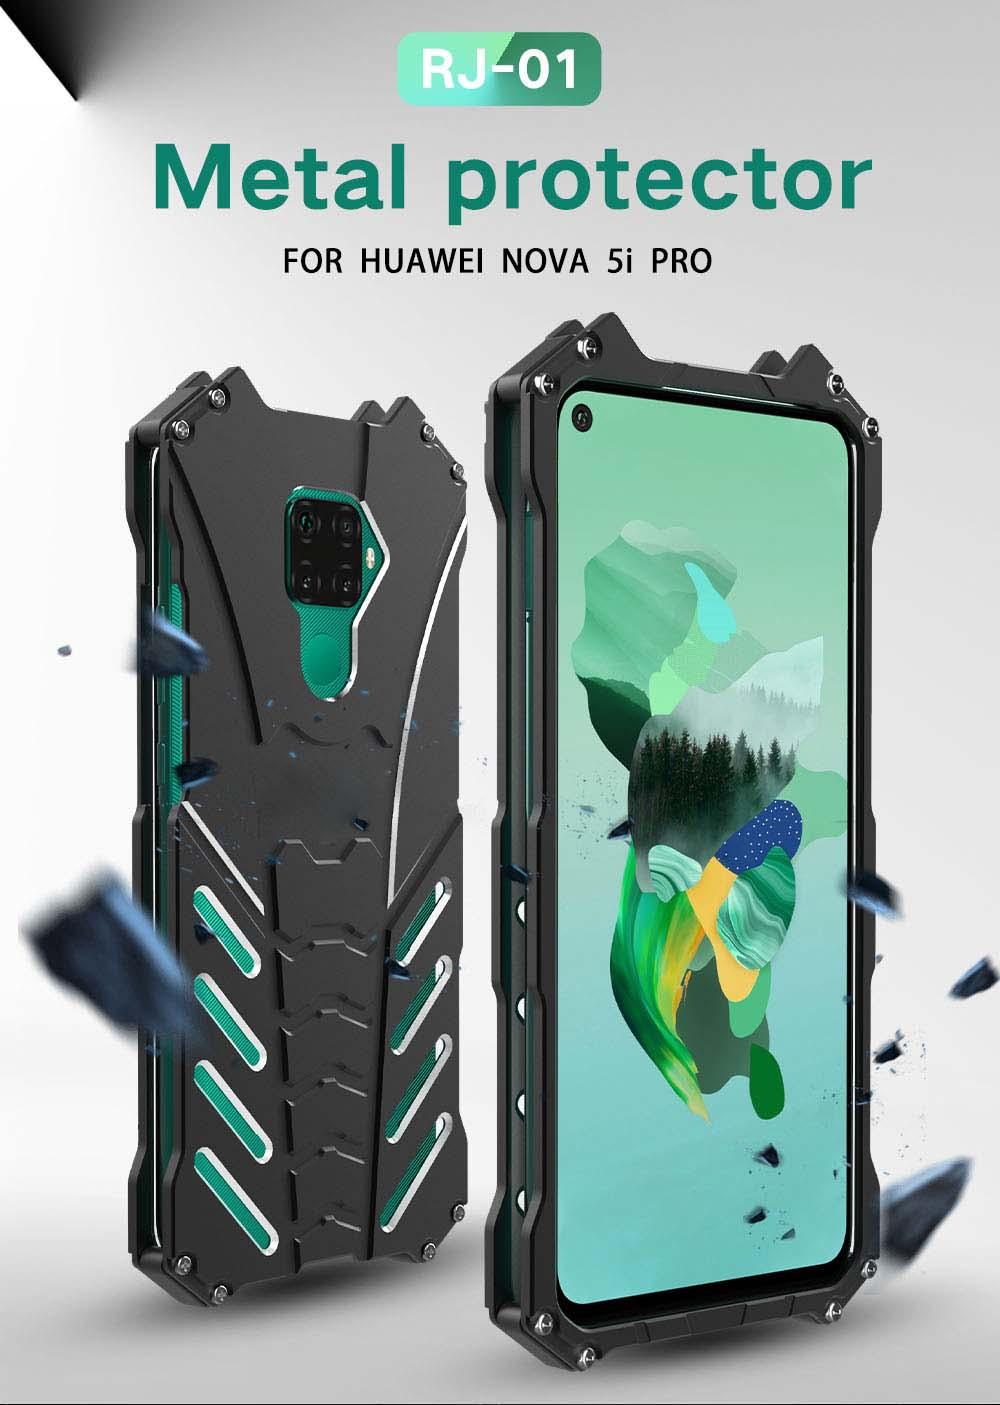 Huawei Nova 5i Pro case